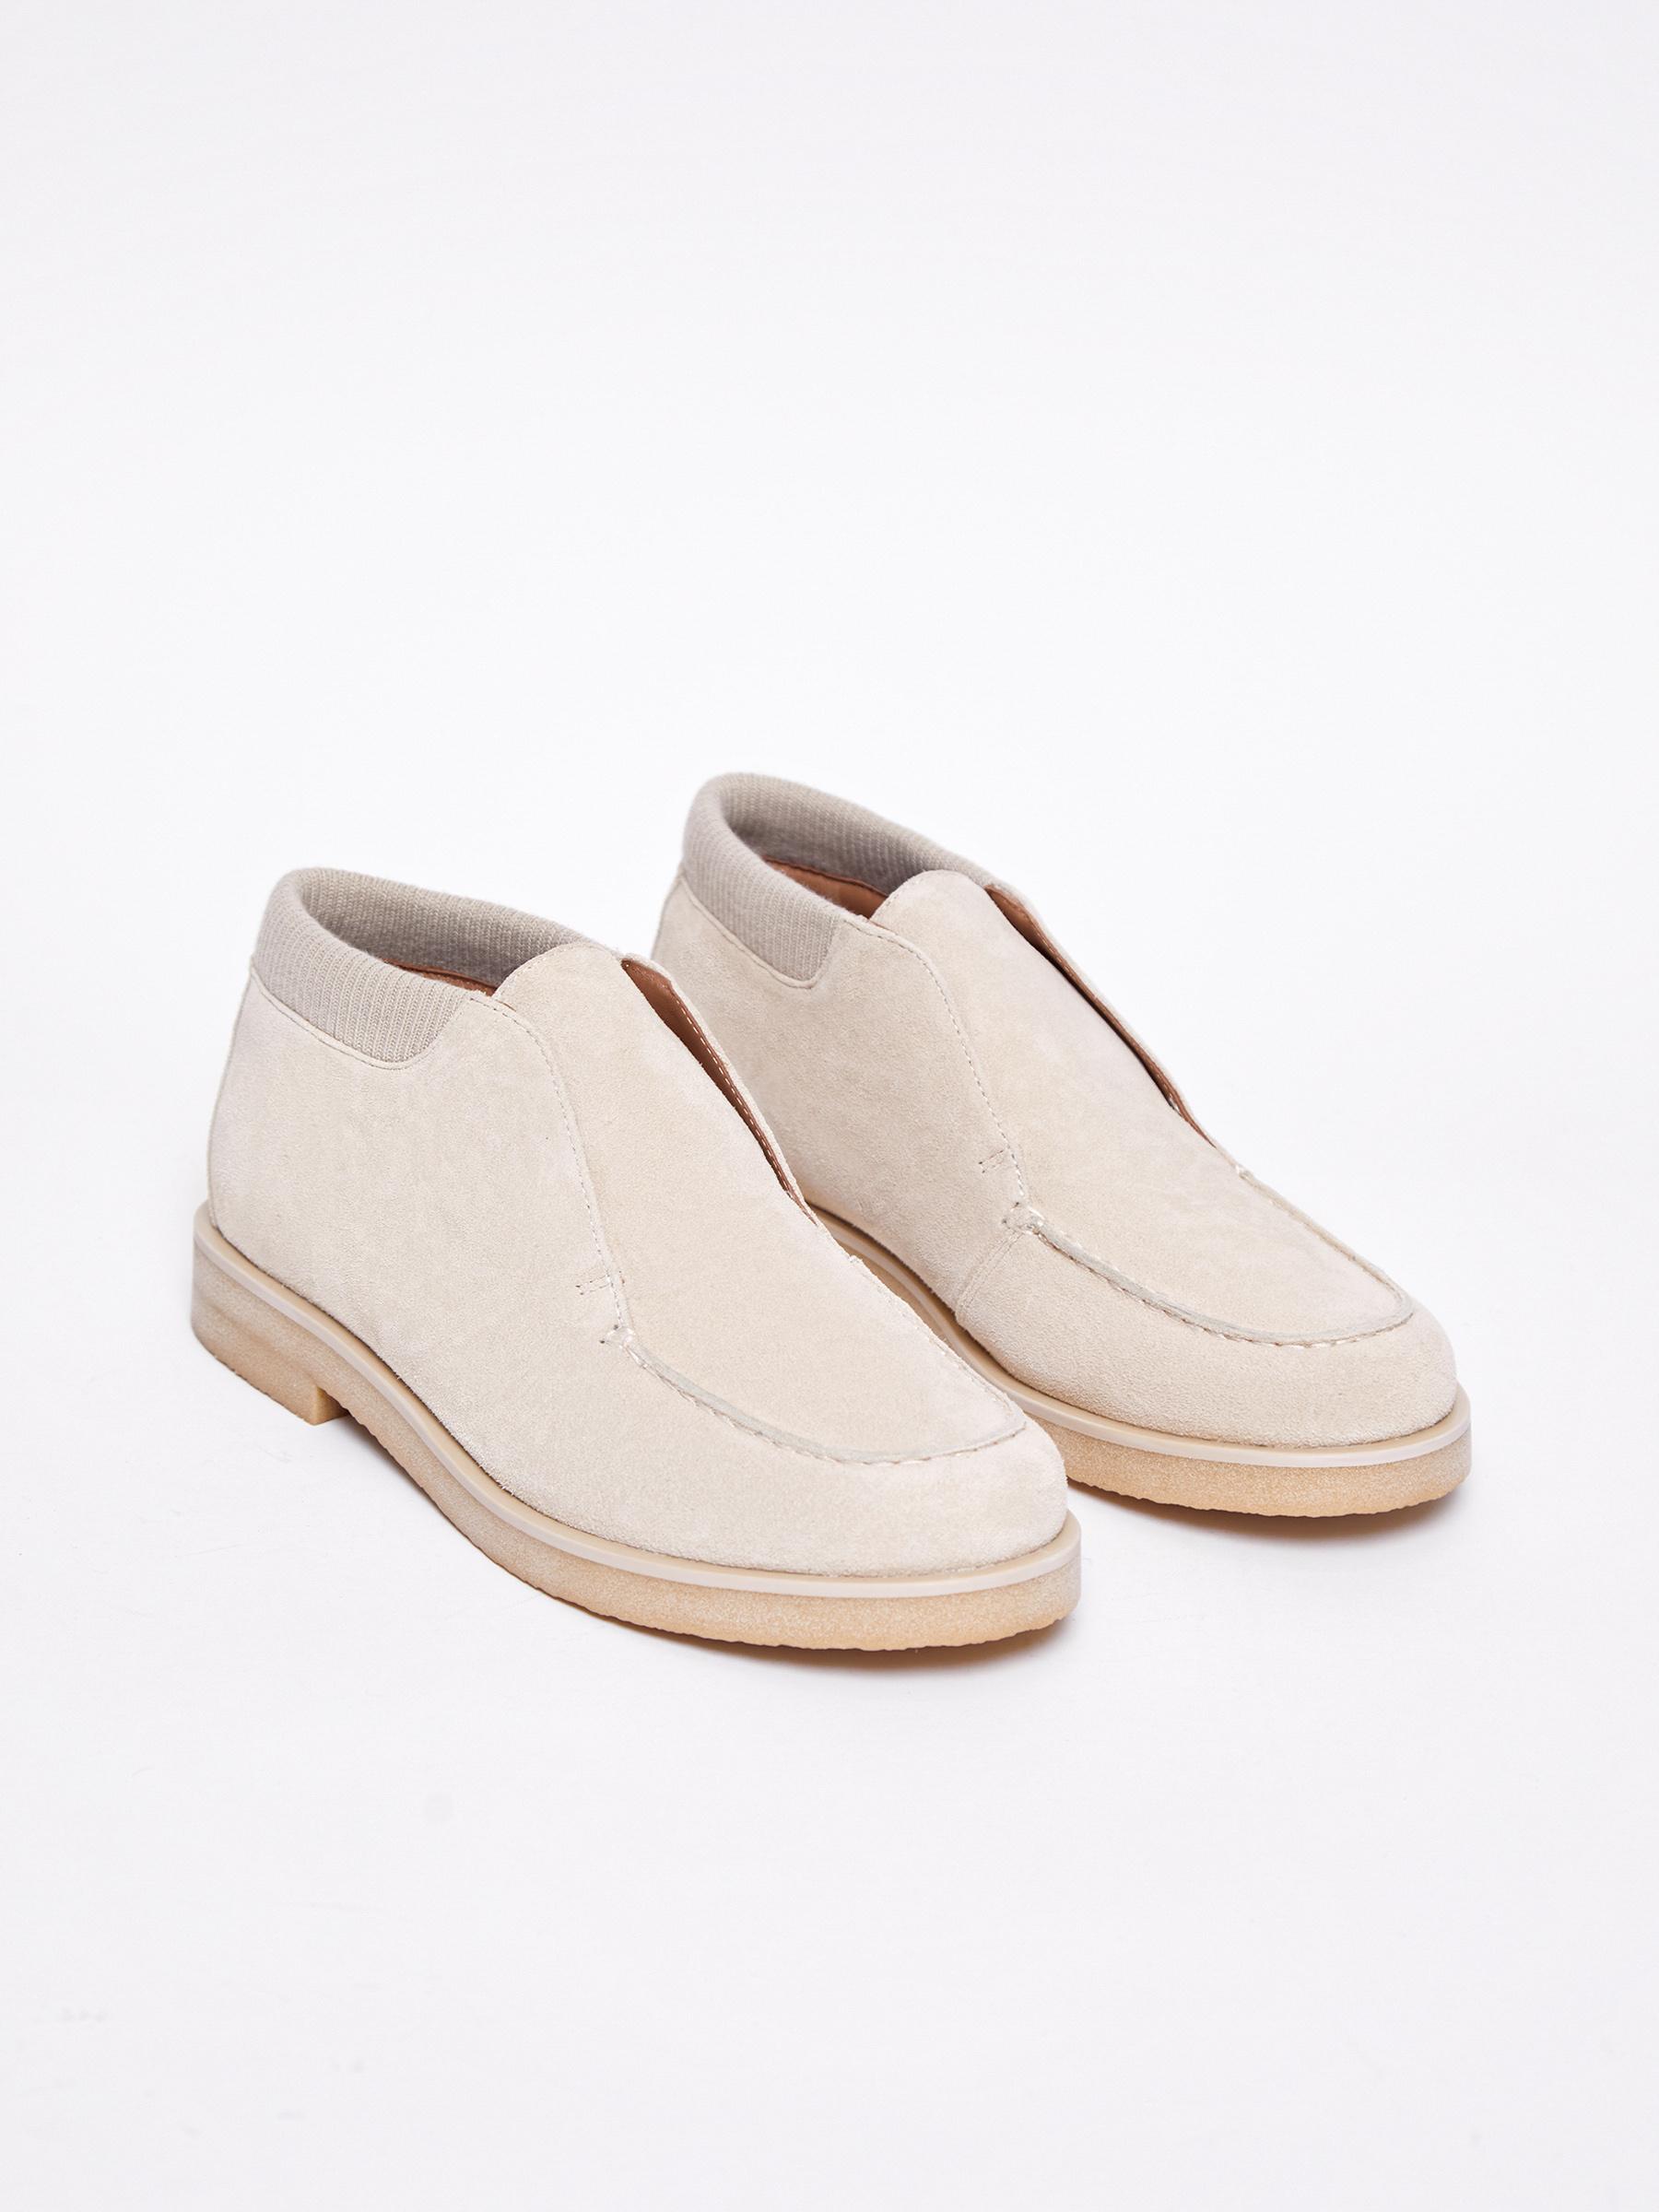 Низкие ботинки на резинке